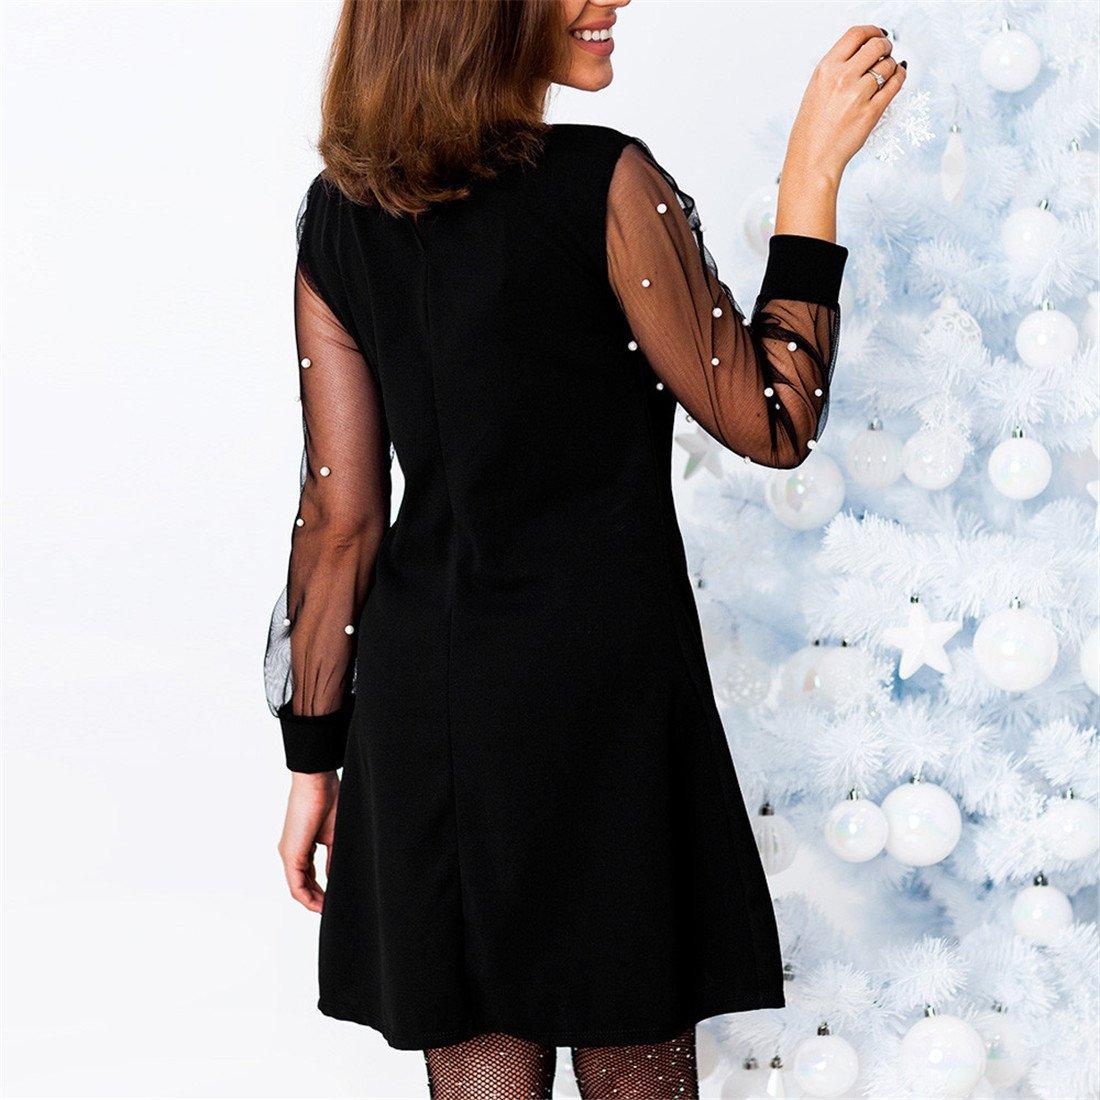 Womens Dresses,Moonuy Girl Long Sleeve Beading Mesh Perspective Mini Evening Party Dress Clubwear Elegant Loose Playsuit Jumpsuits Beach Dress For Ladies ...